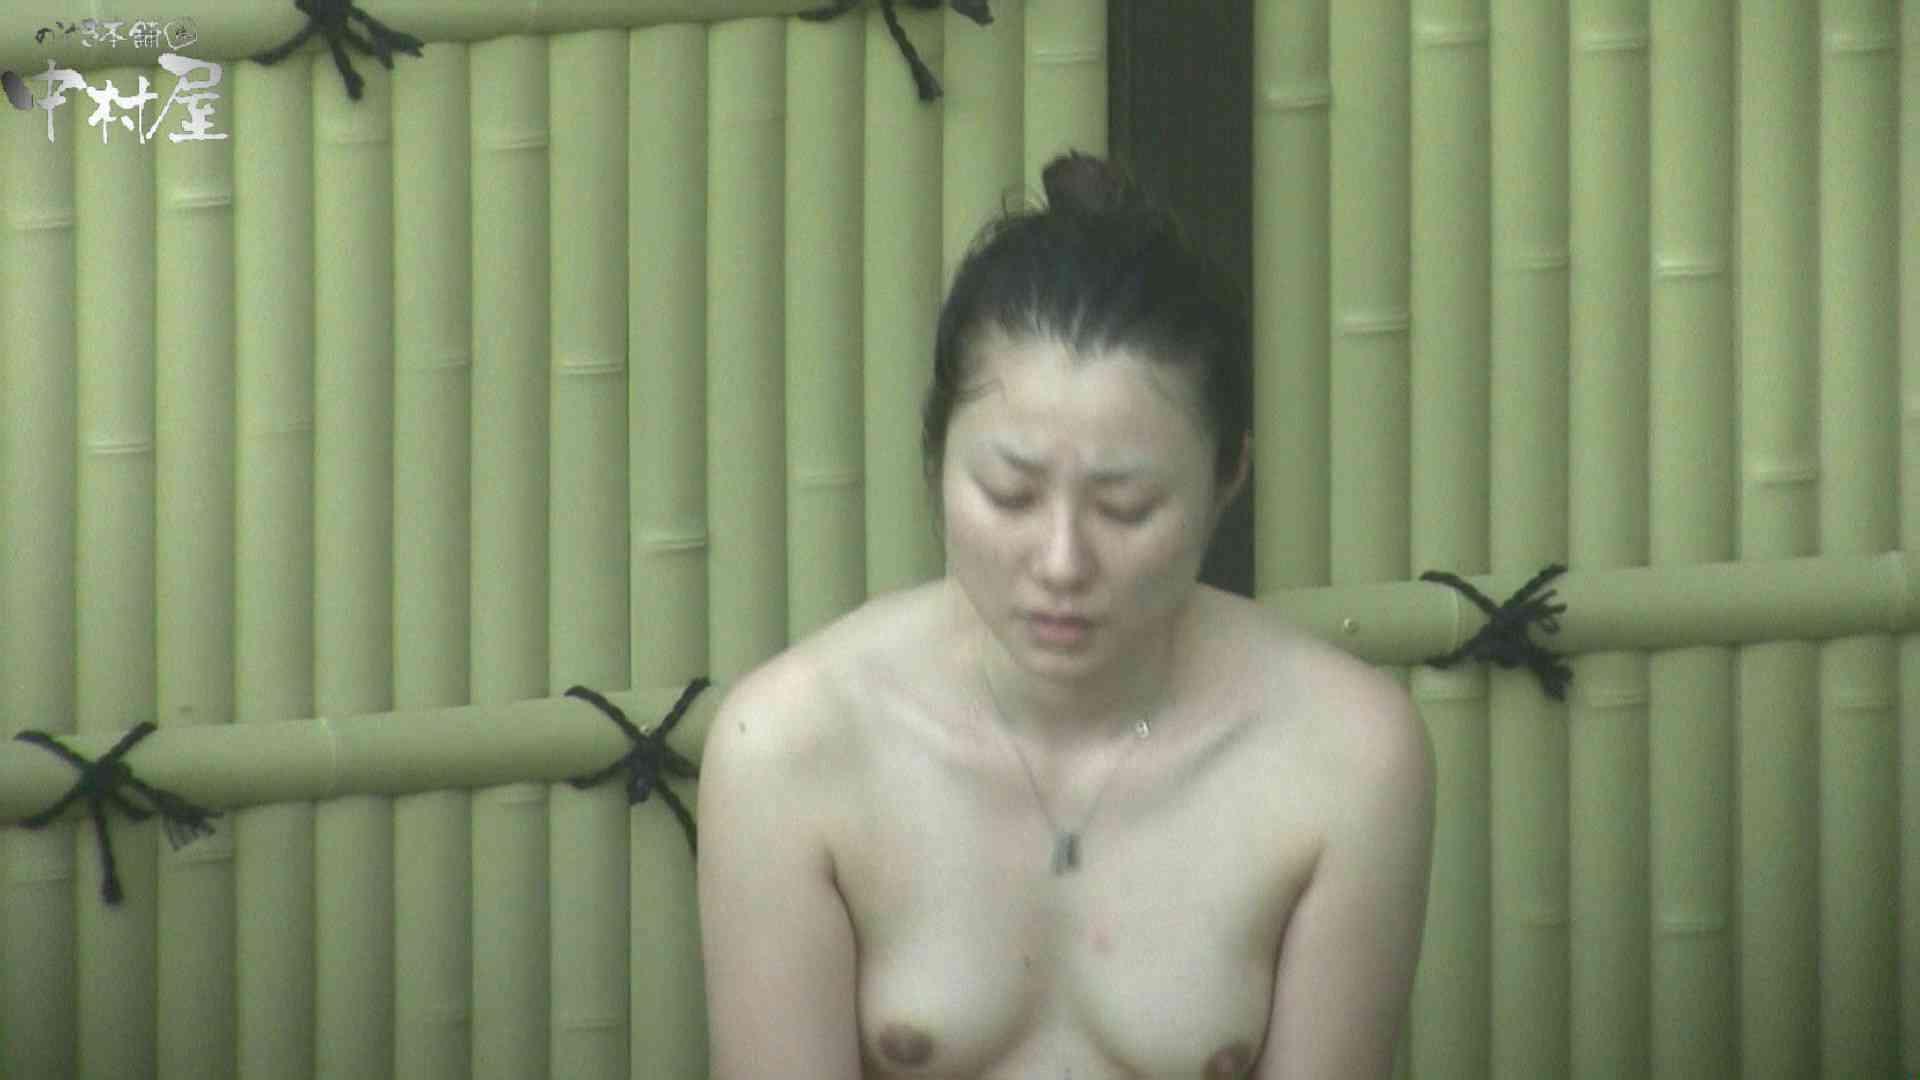 Aquaな露天風呂Vol.969 露天 のぞき動画画像 52画像 14